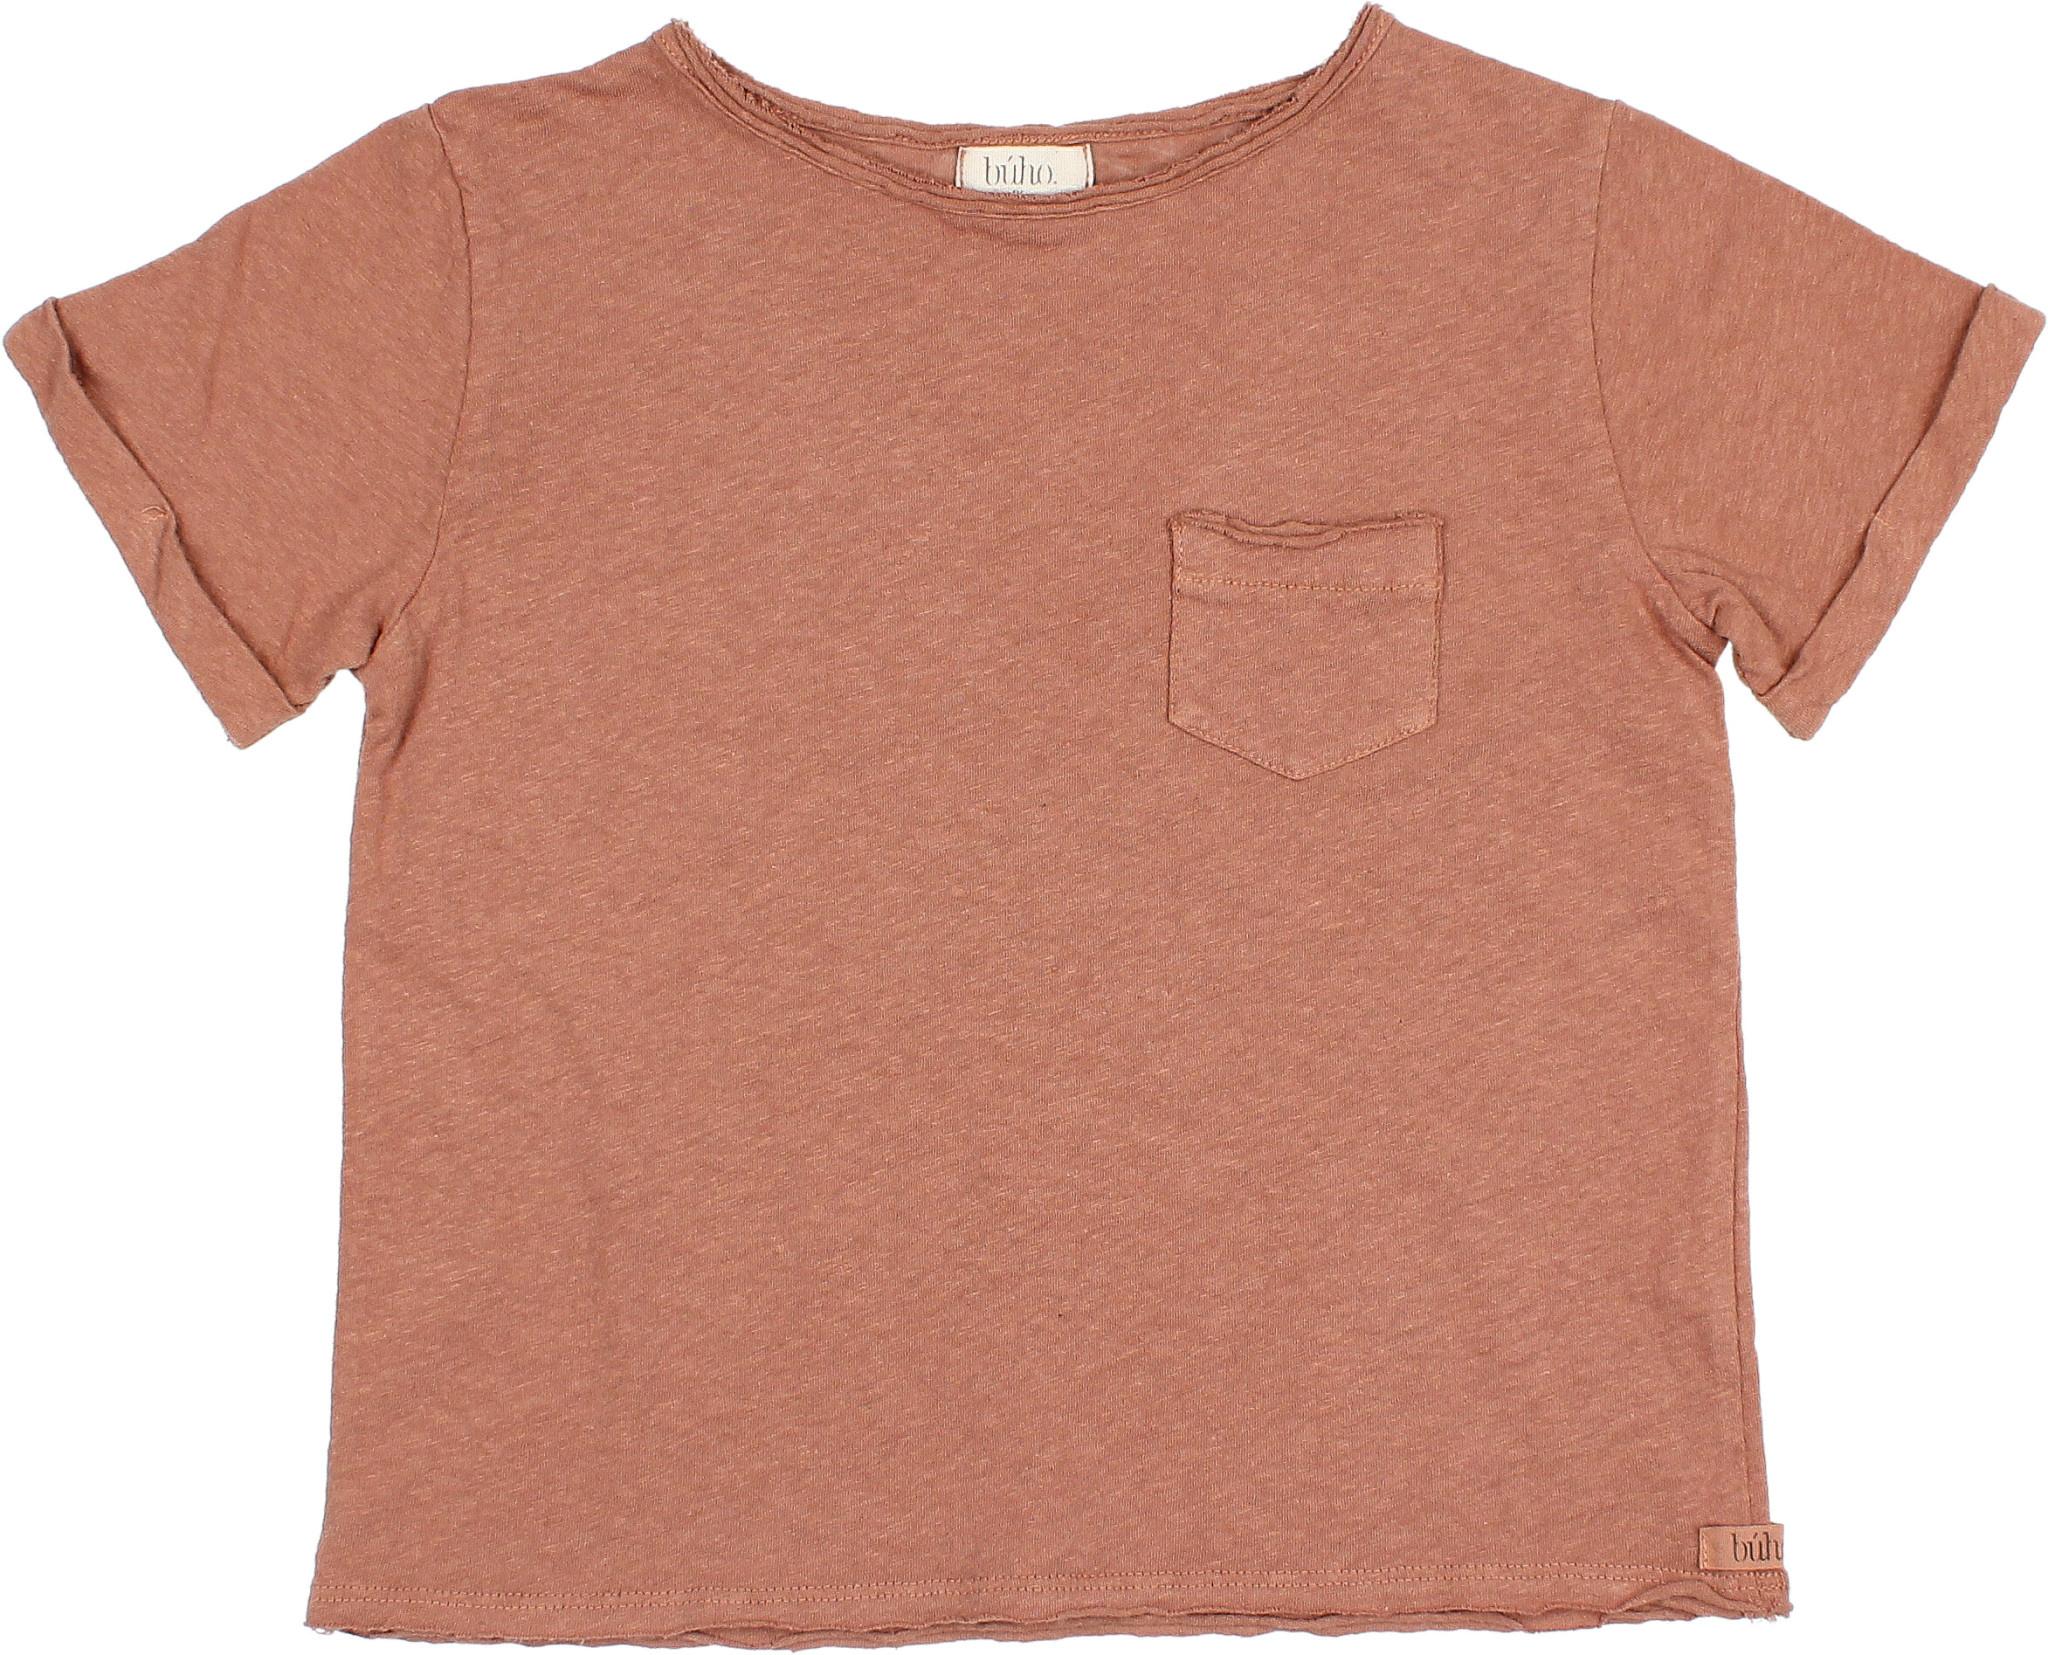 James t-shirt cocoa-3